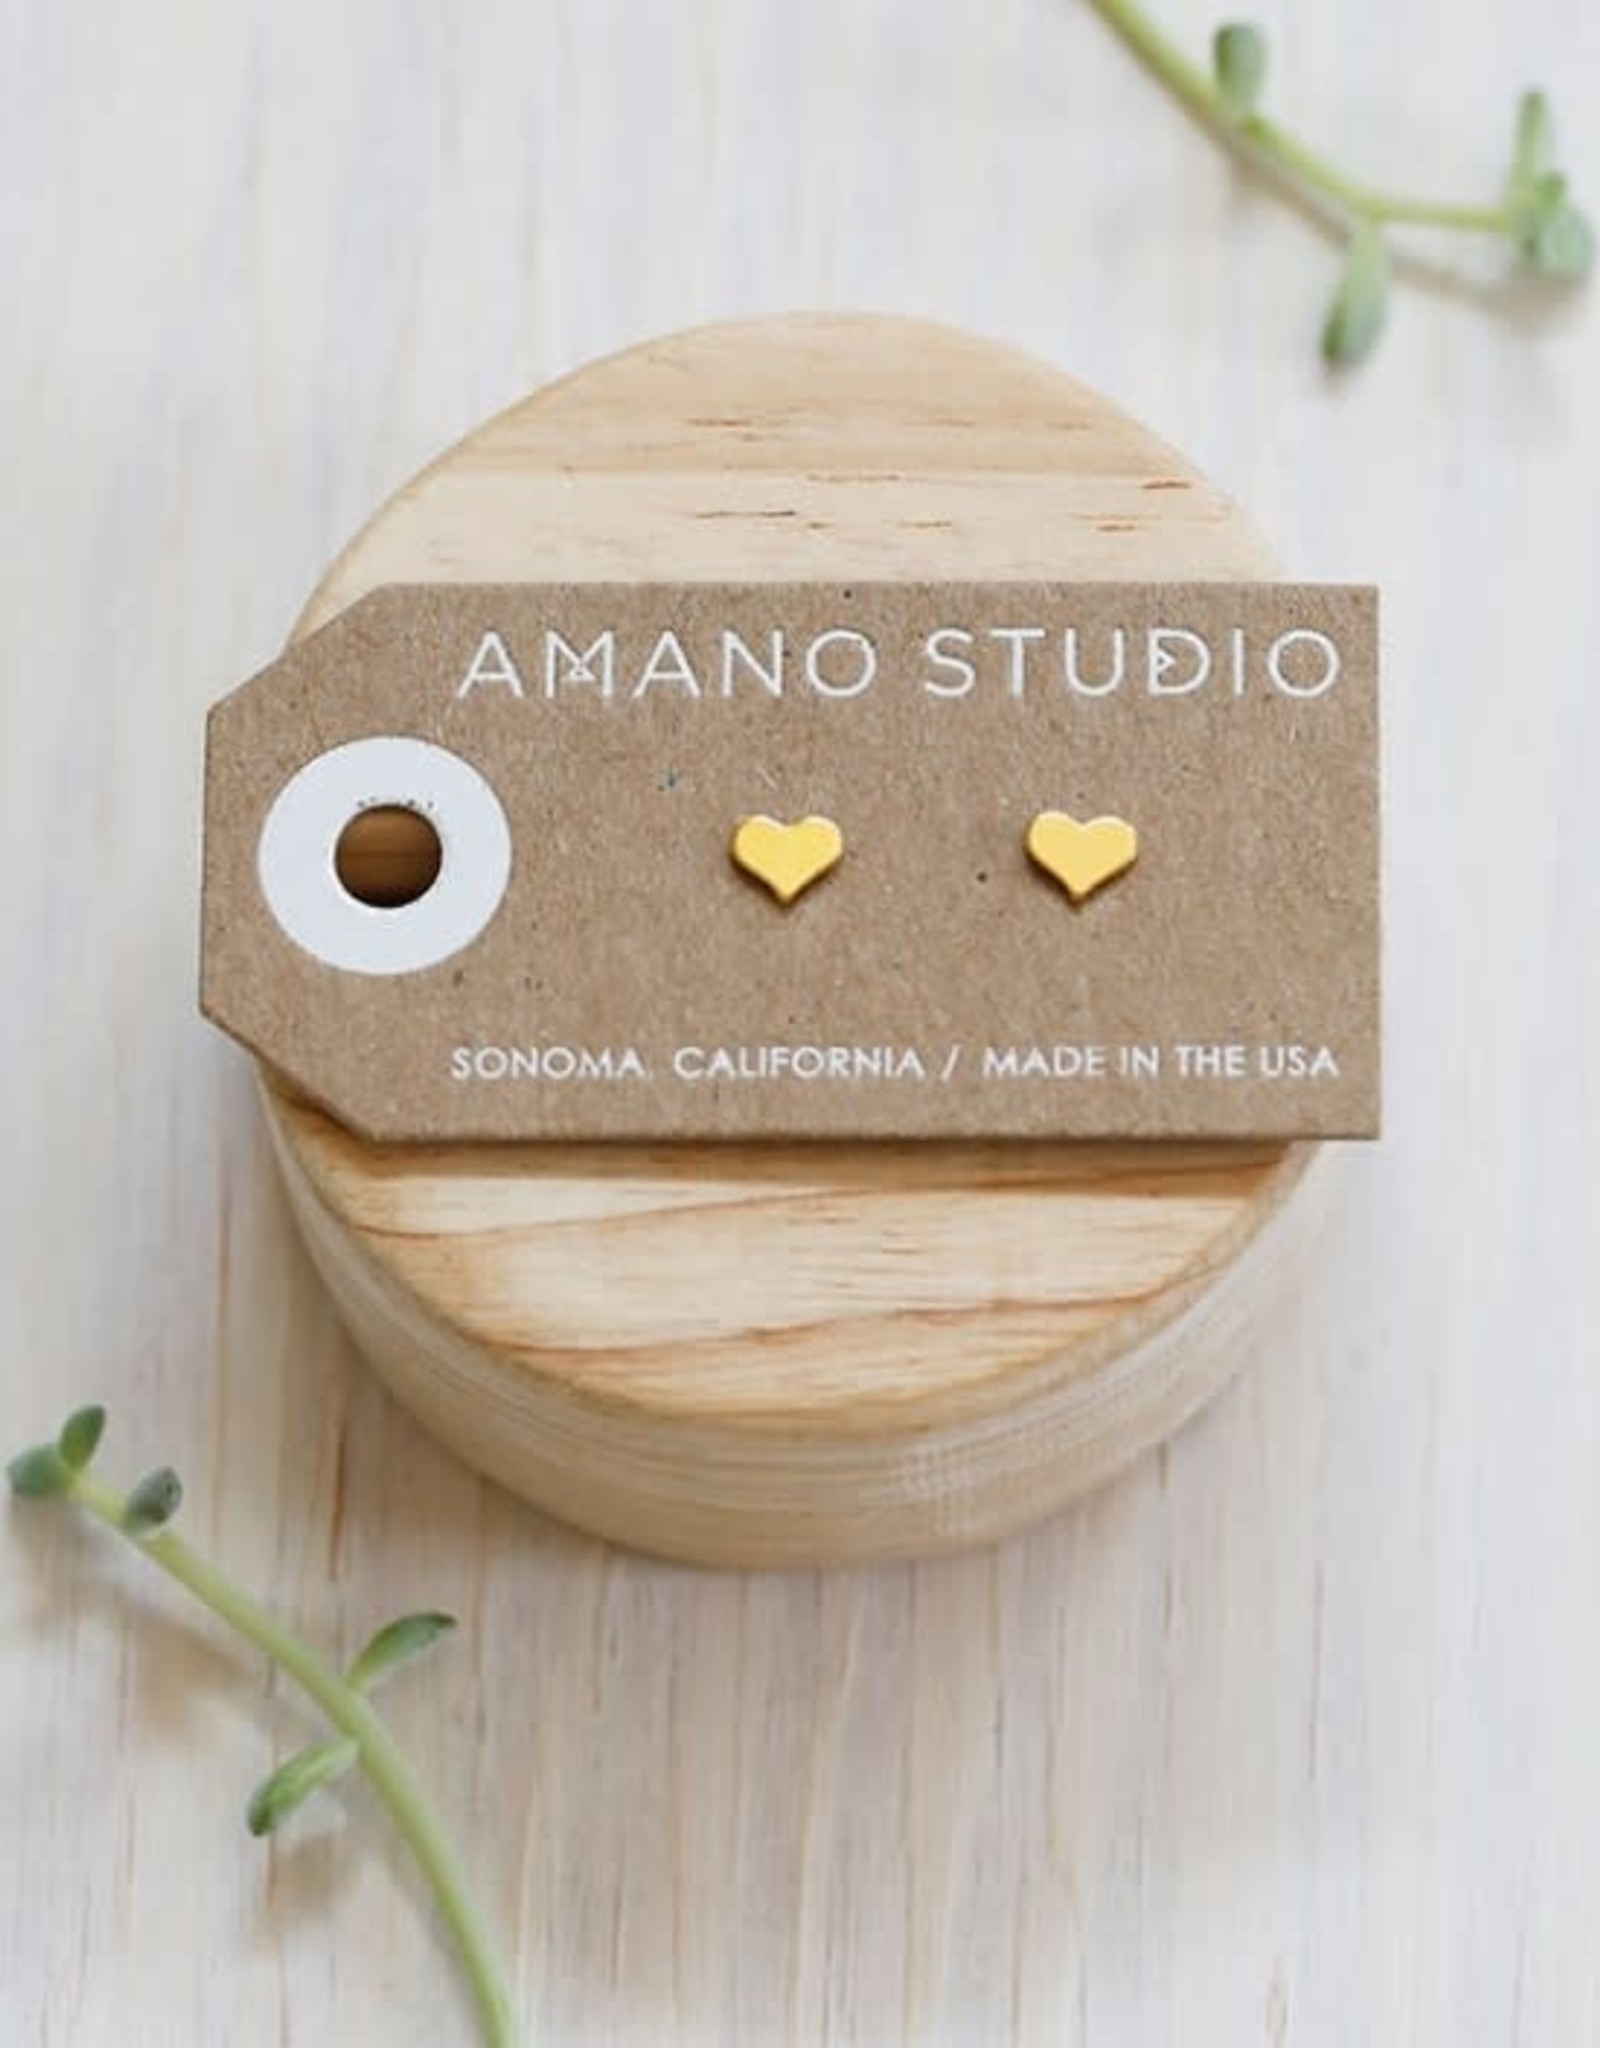 AMANO studio HEART studs, 24K gold plated